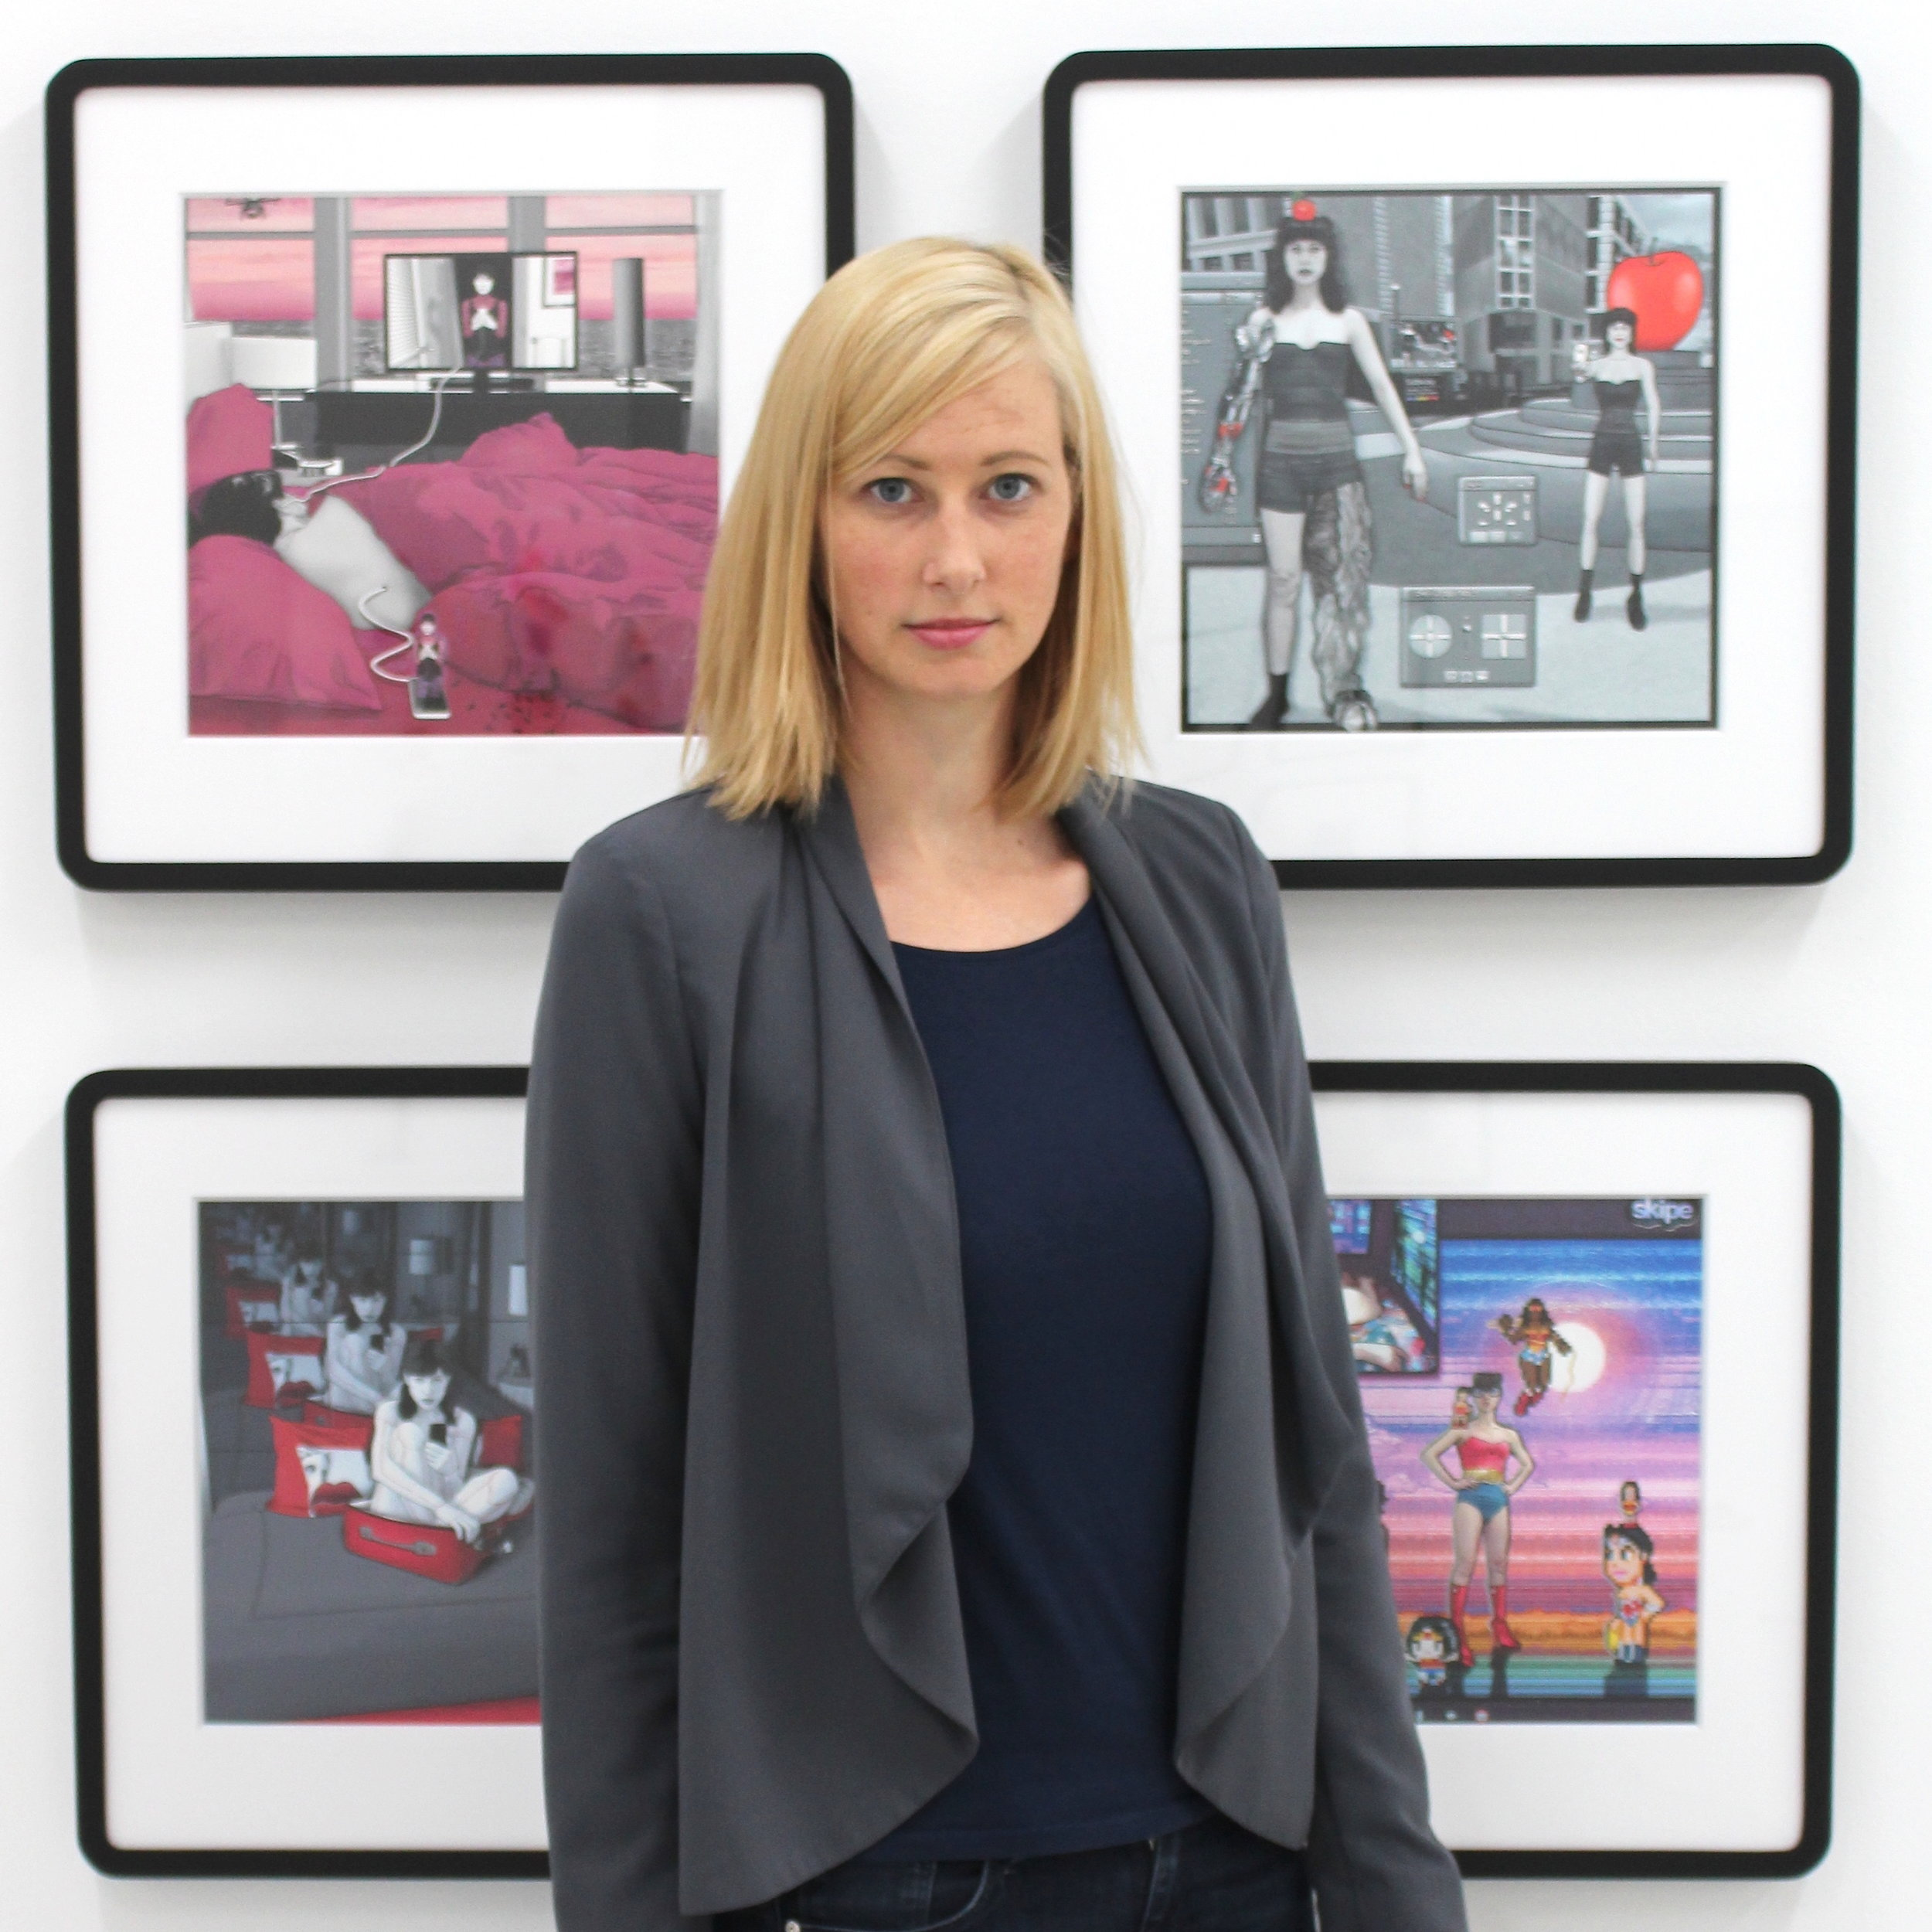 Tina Sauerlaender with works by Carla Gannis.JPG